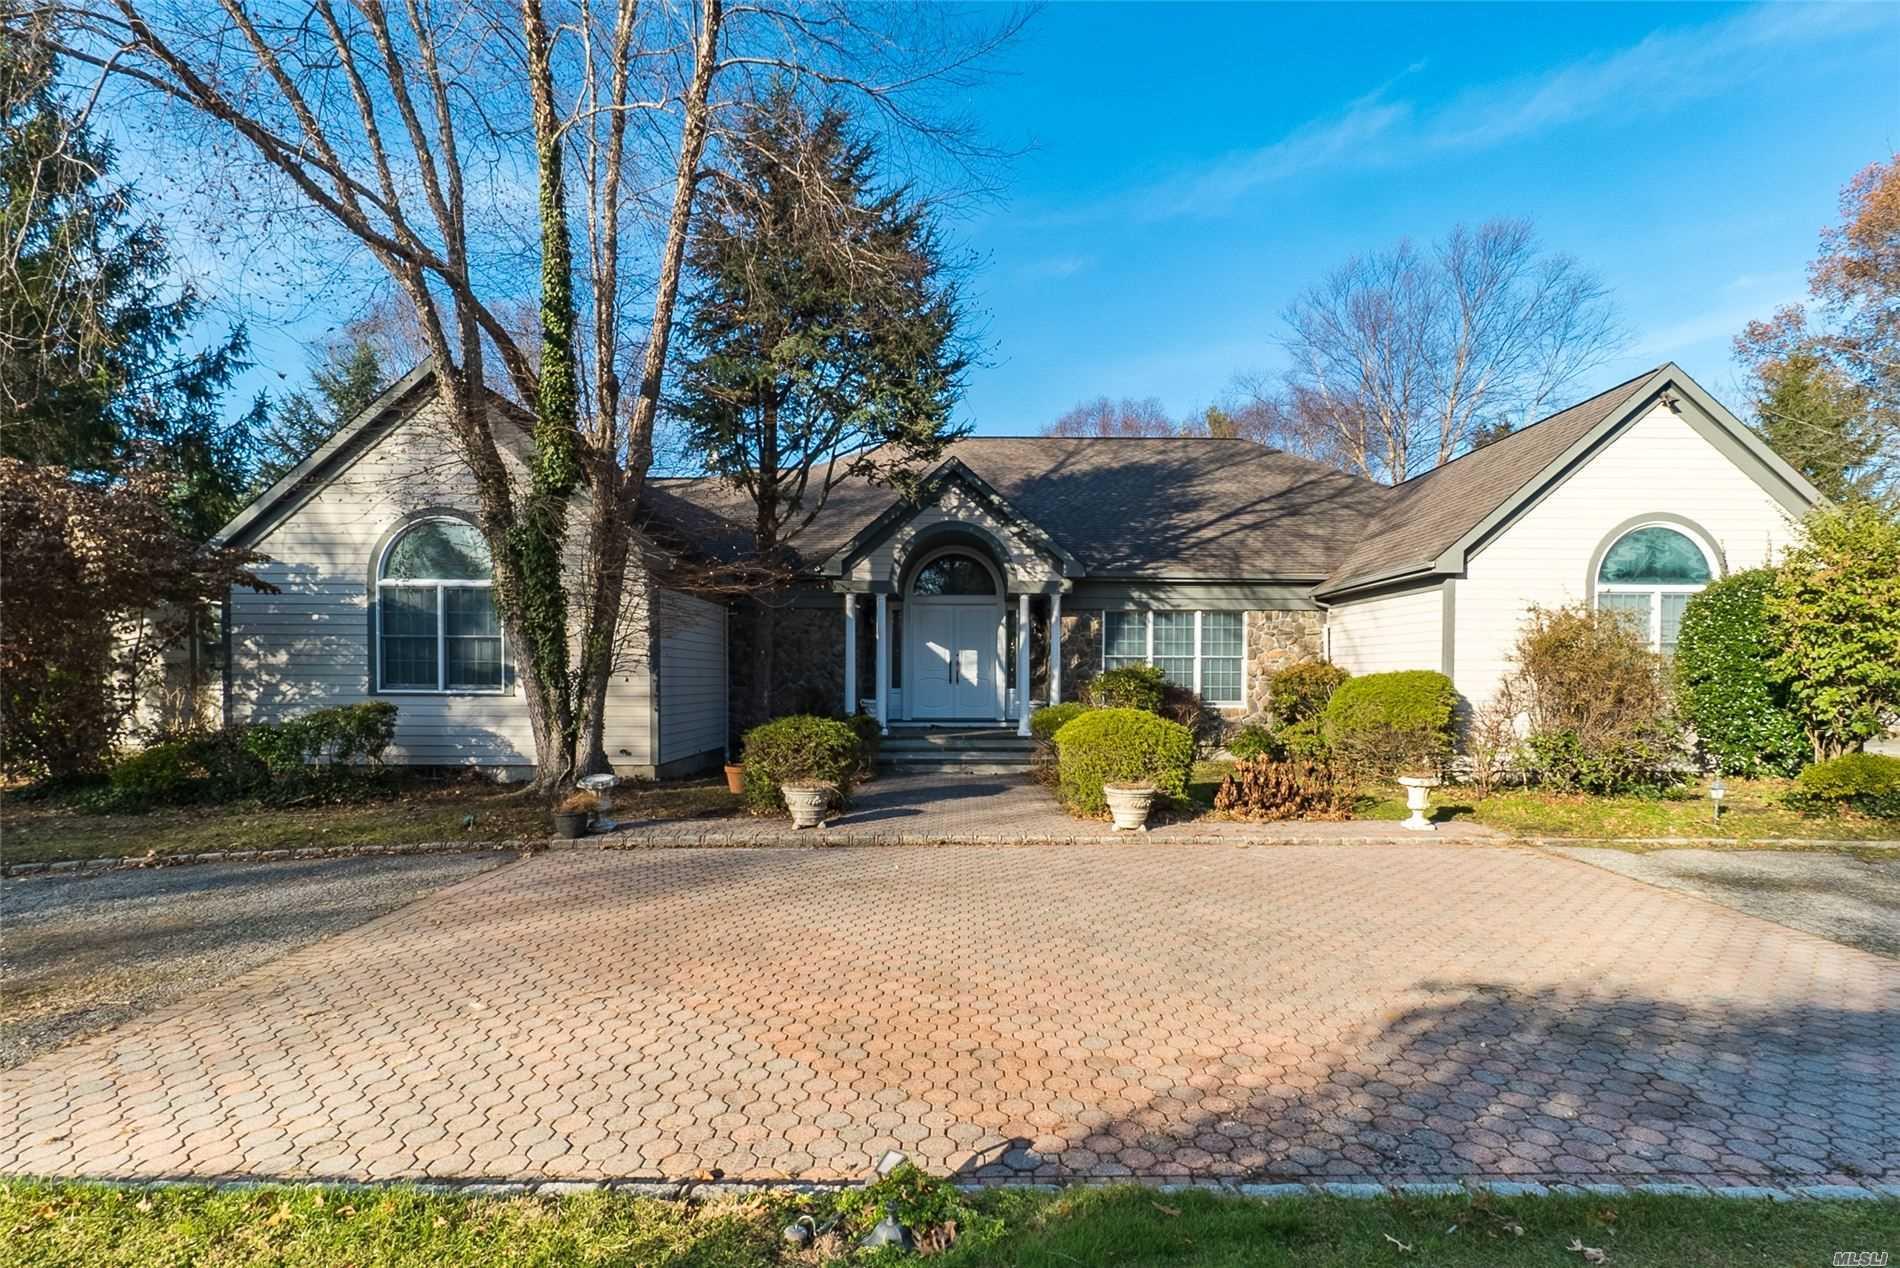 Property for sale at 15 Stirrup Drive, Old Brookville NY 11545, Old Brookville,  New York 11545